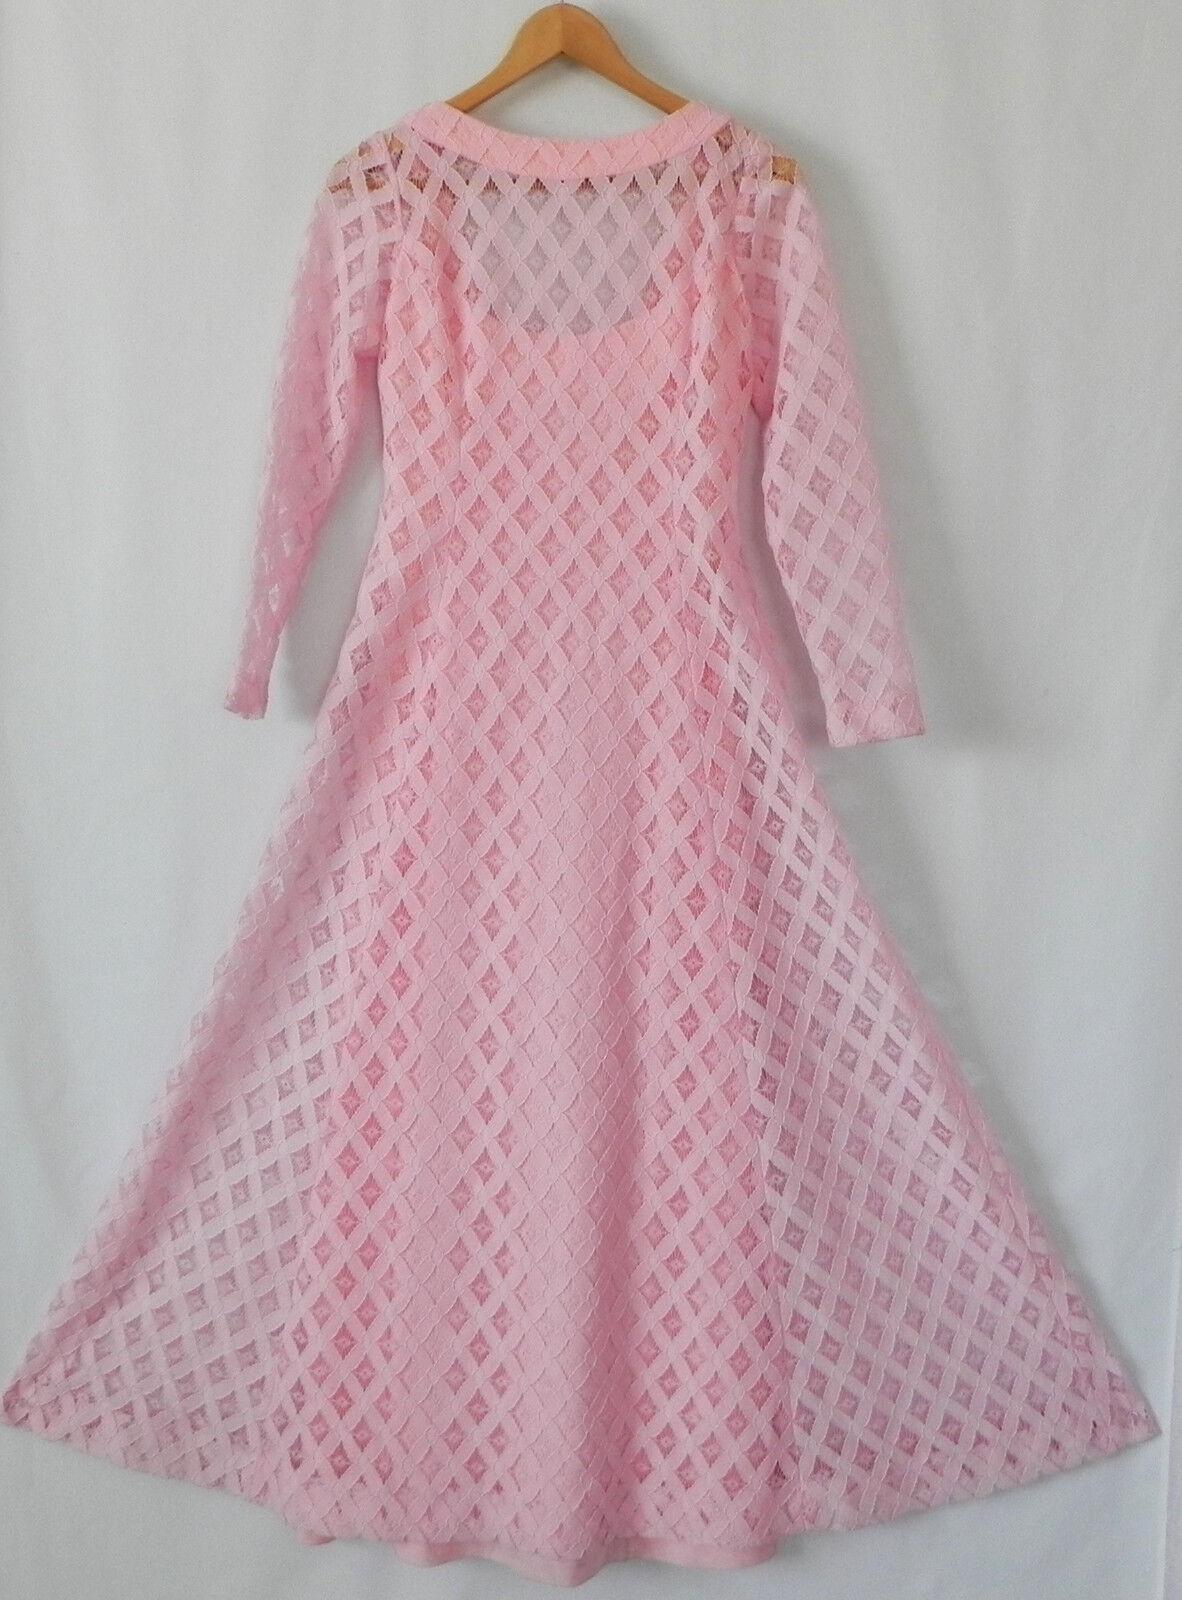 Vtg ILGWU Union Dress Pink Lace Maxi Fit-Flared Long Sleeve Size S M